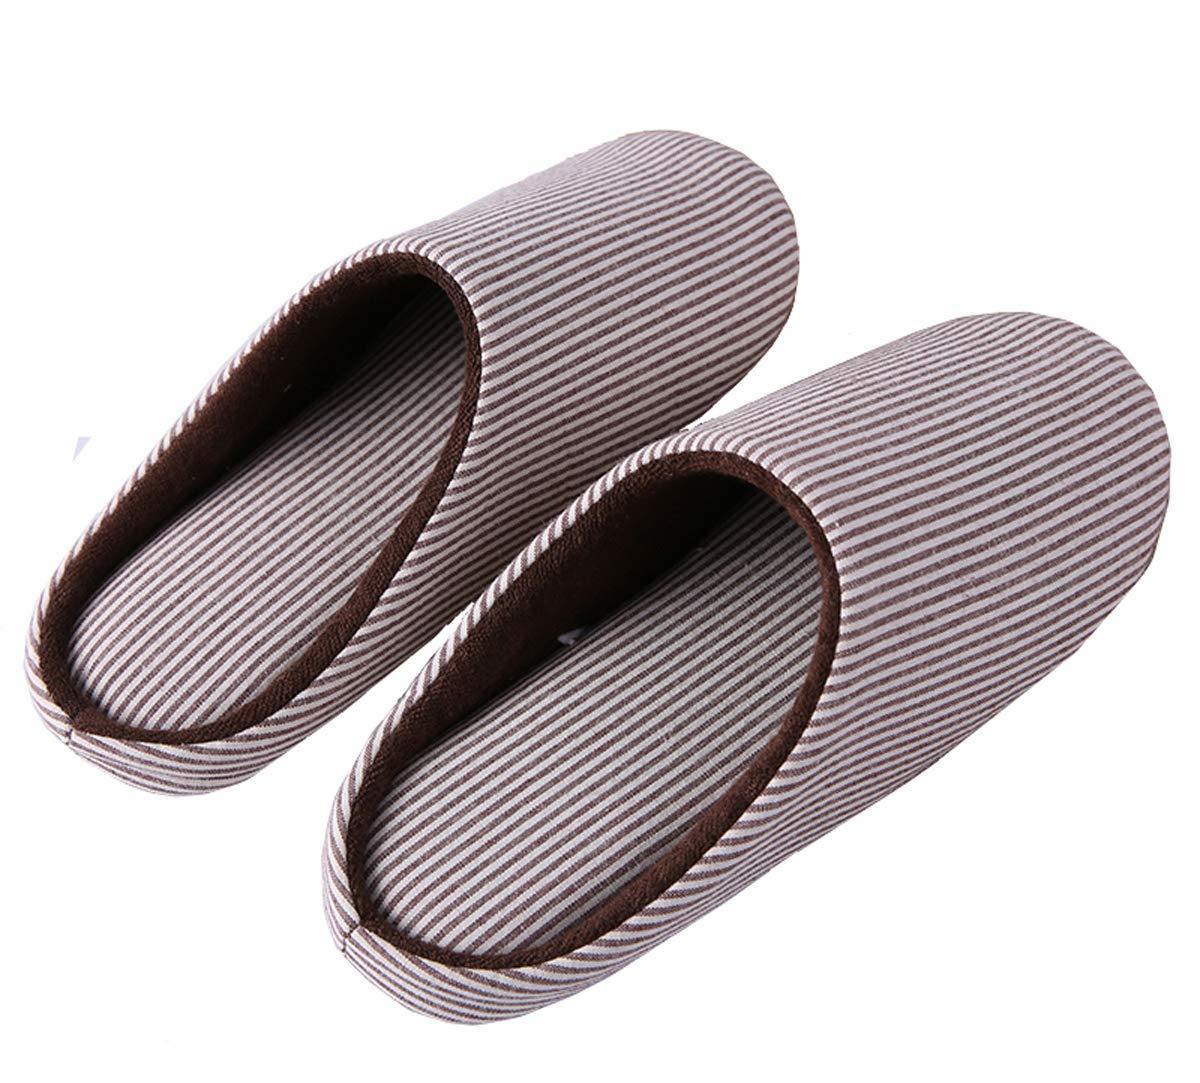 HaoJiLi Men's House Slippers Indoor Memory Foam Cotton Anti-Slip Ultra Lightweight (L=Women 9-10 B(M) / Men 8-9 D(M), Brown/White)